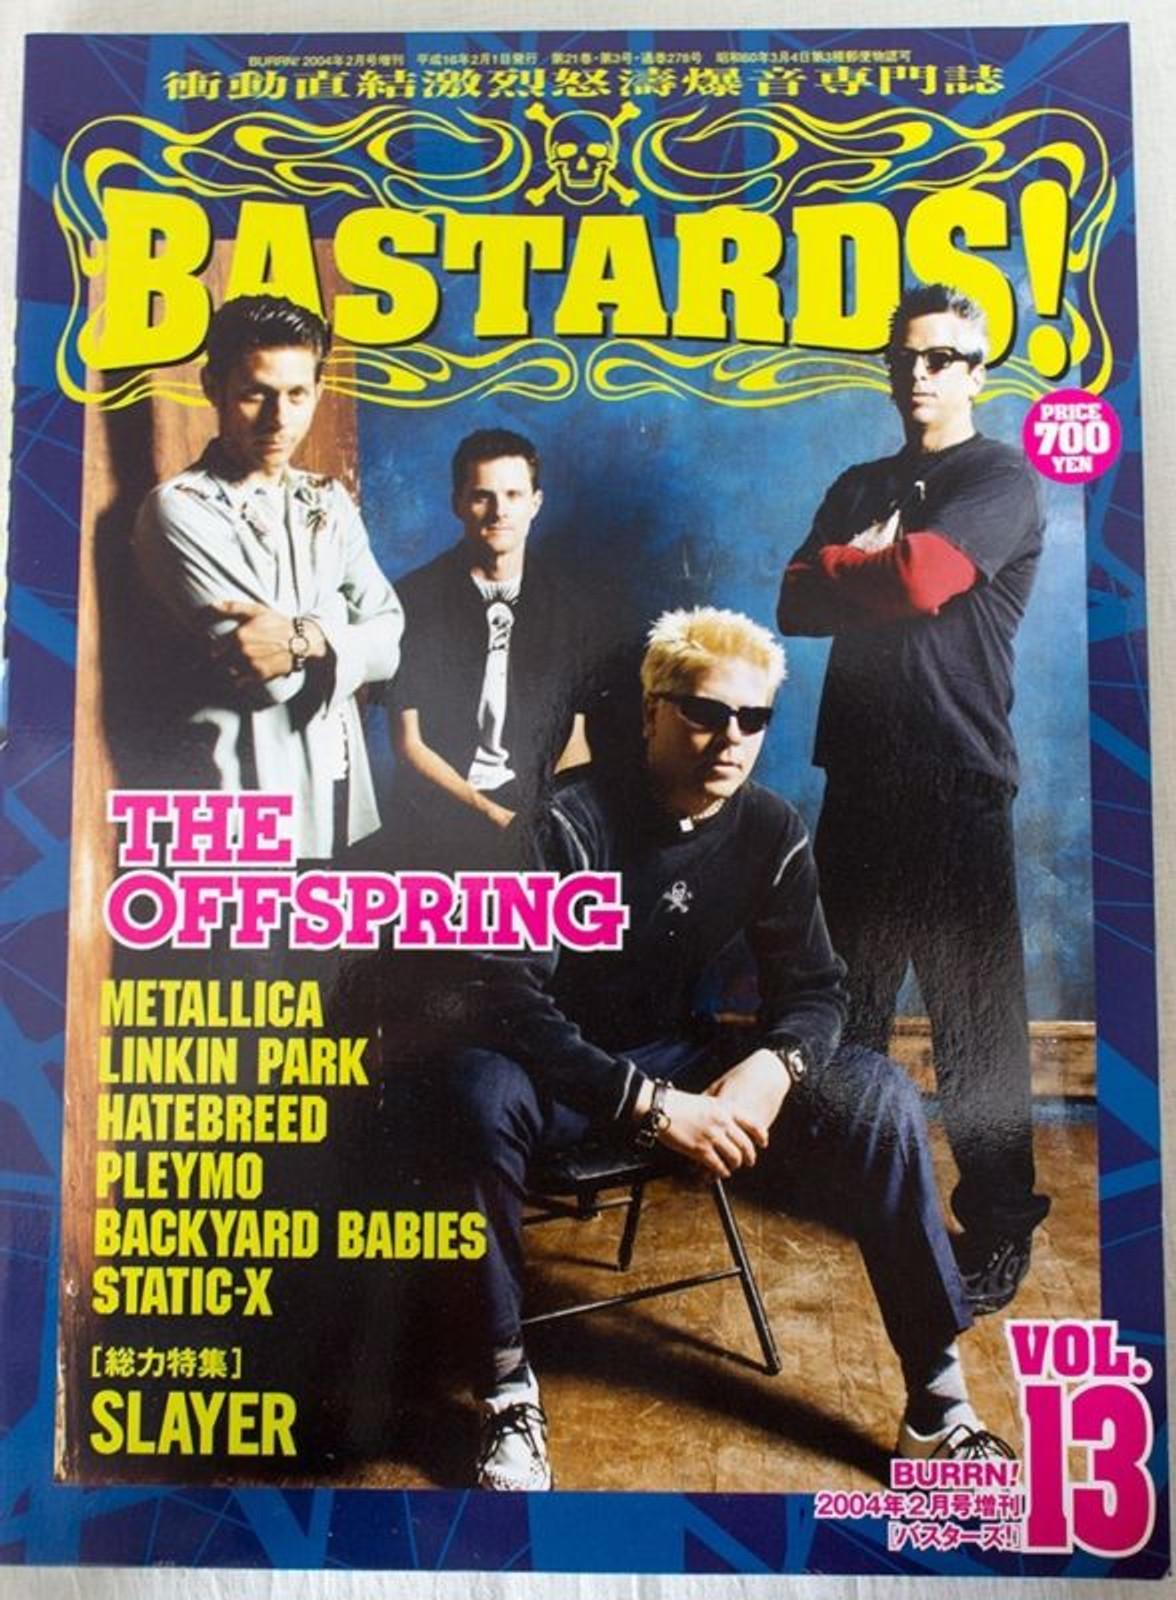 2004 Vol.13 BASTARDS! BURRN! Japan Magazine THE OFFSPRING/BACKYARD BABIES/PLEYMO